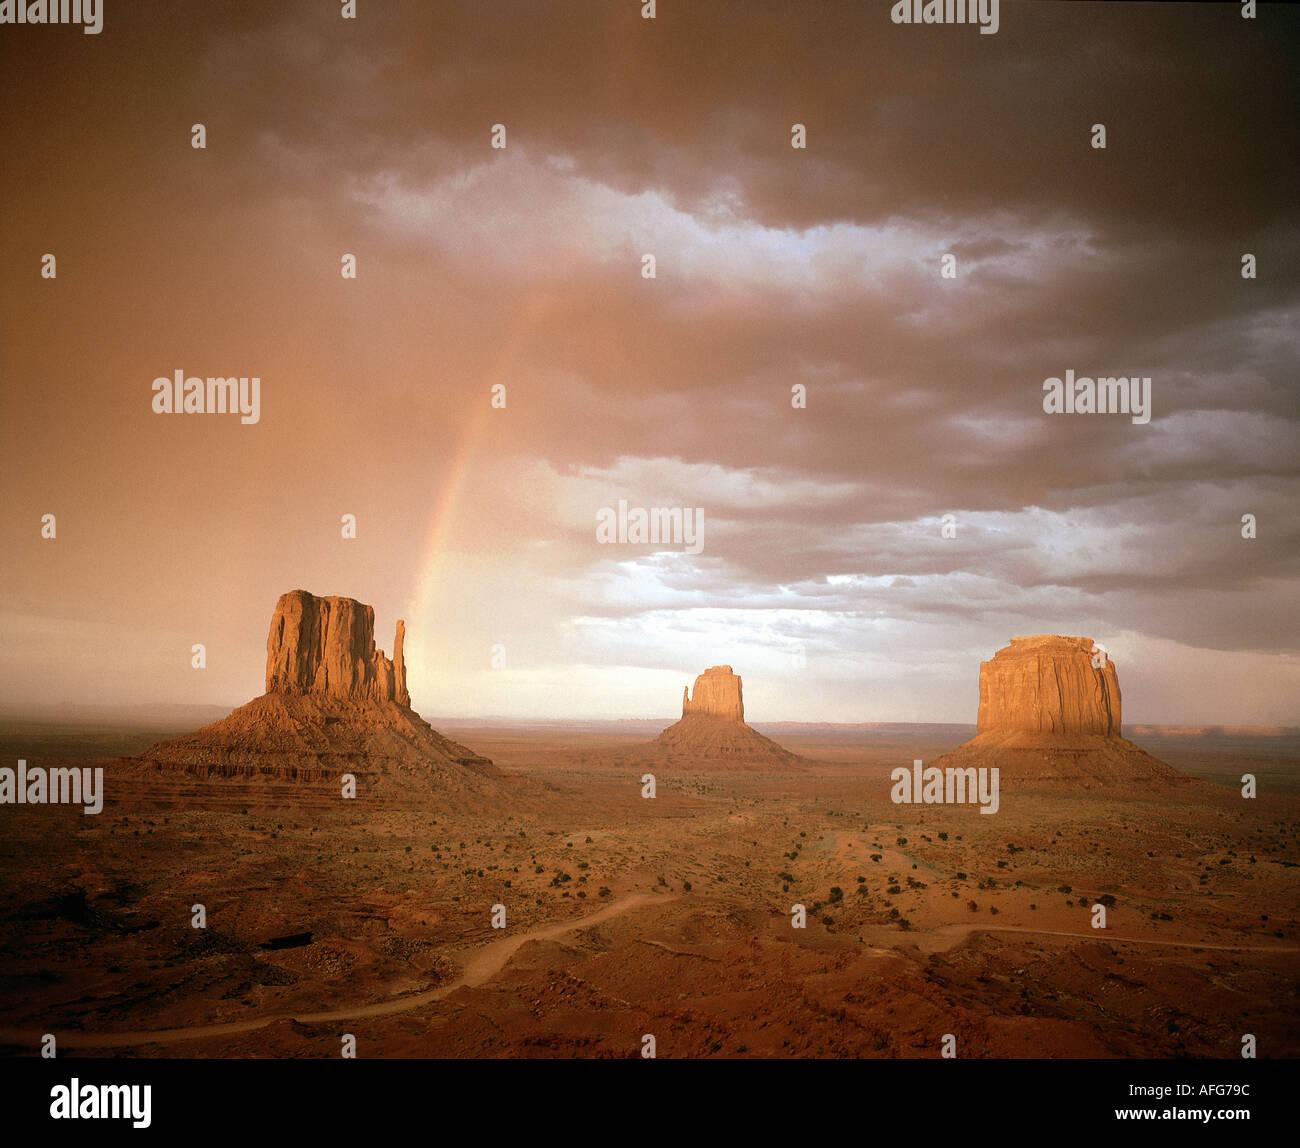 USA - ARIZONA: Monument Valley Photo Stock